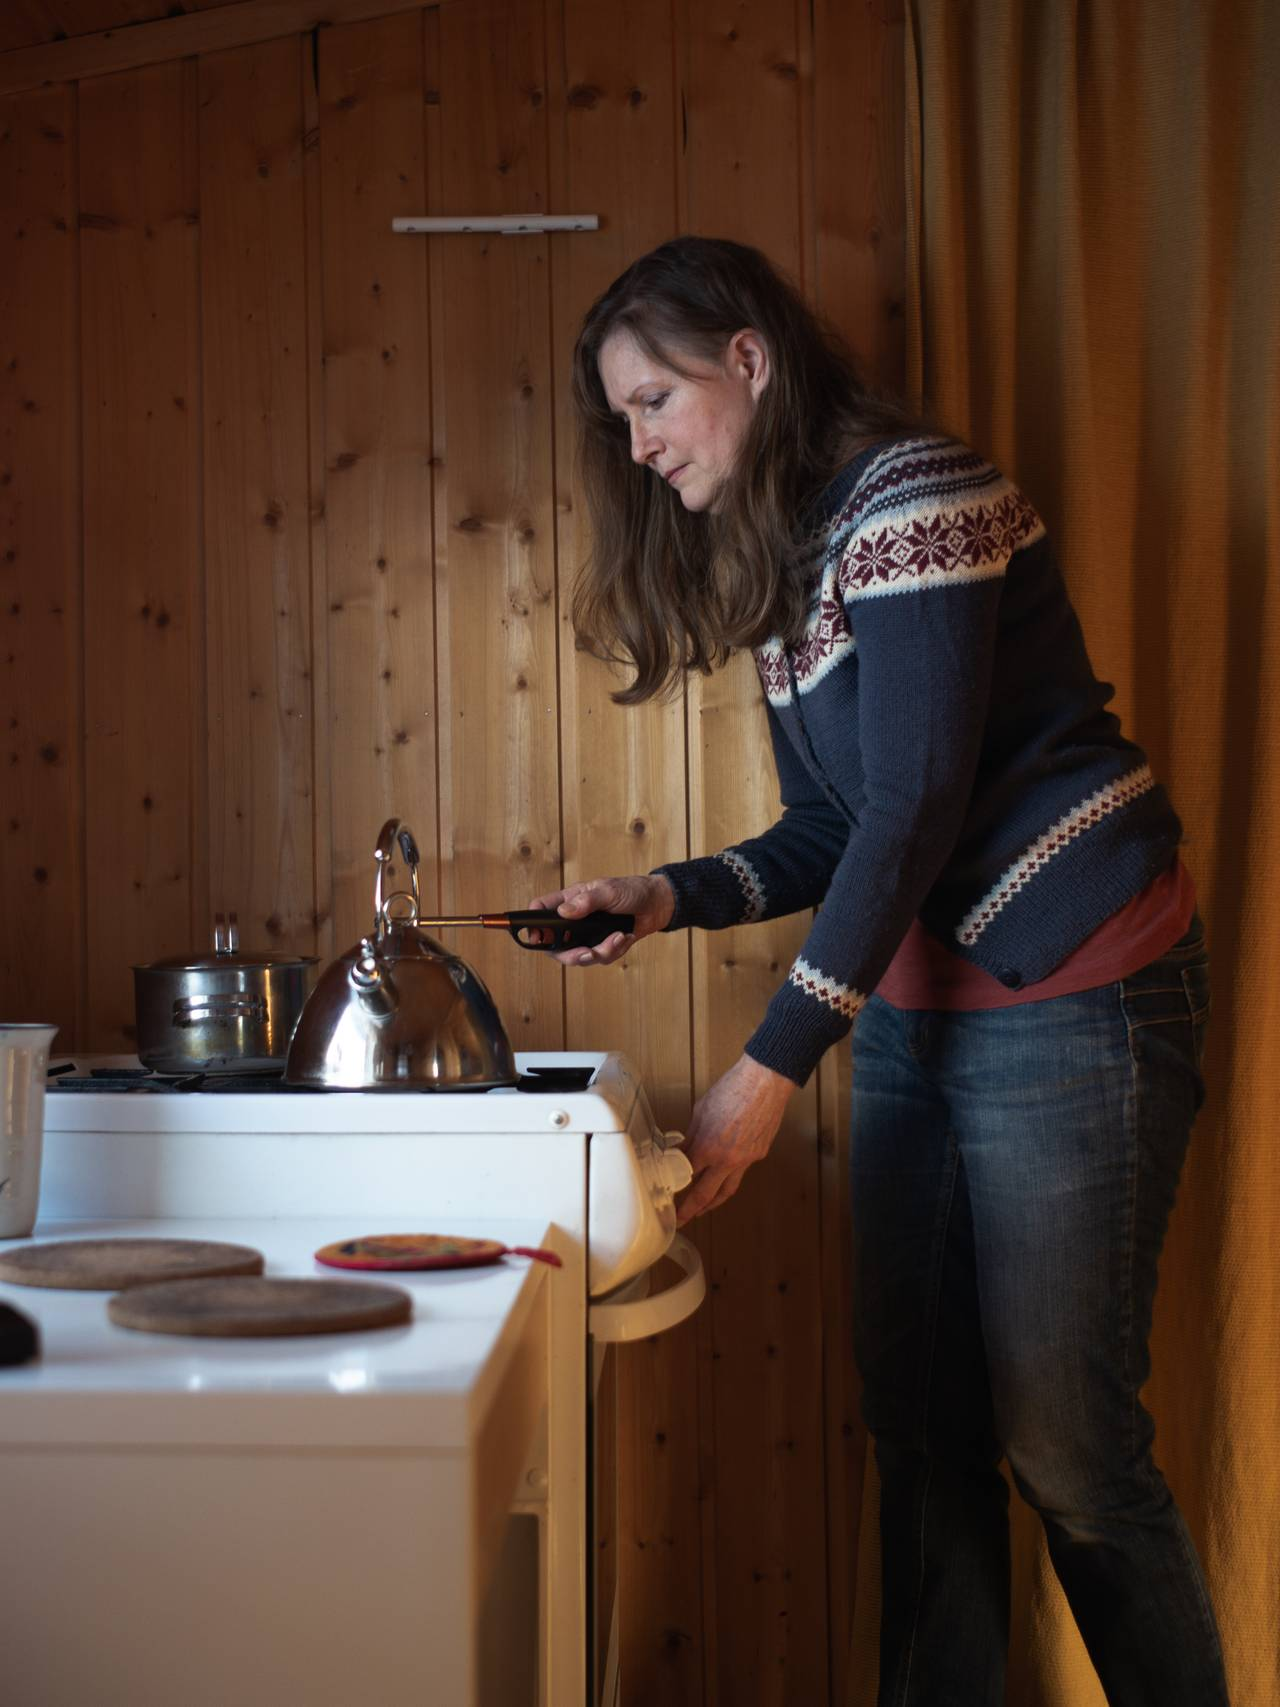 Debora Atwood flykter fra stråling. Hun lager mat på gasskomfyr.